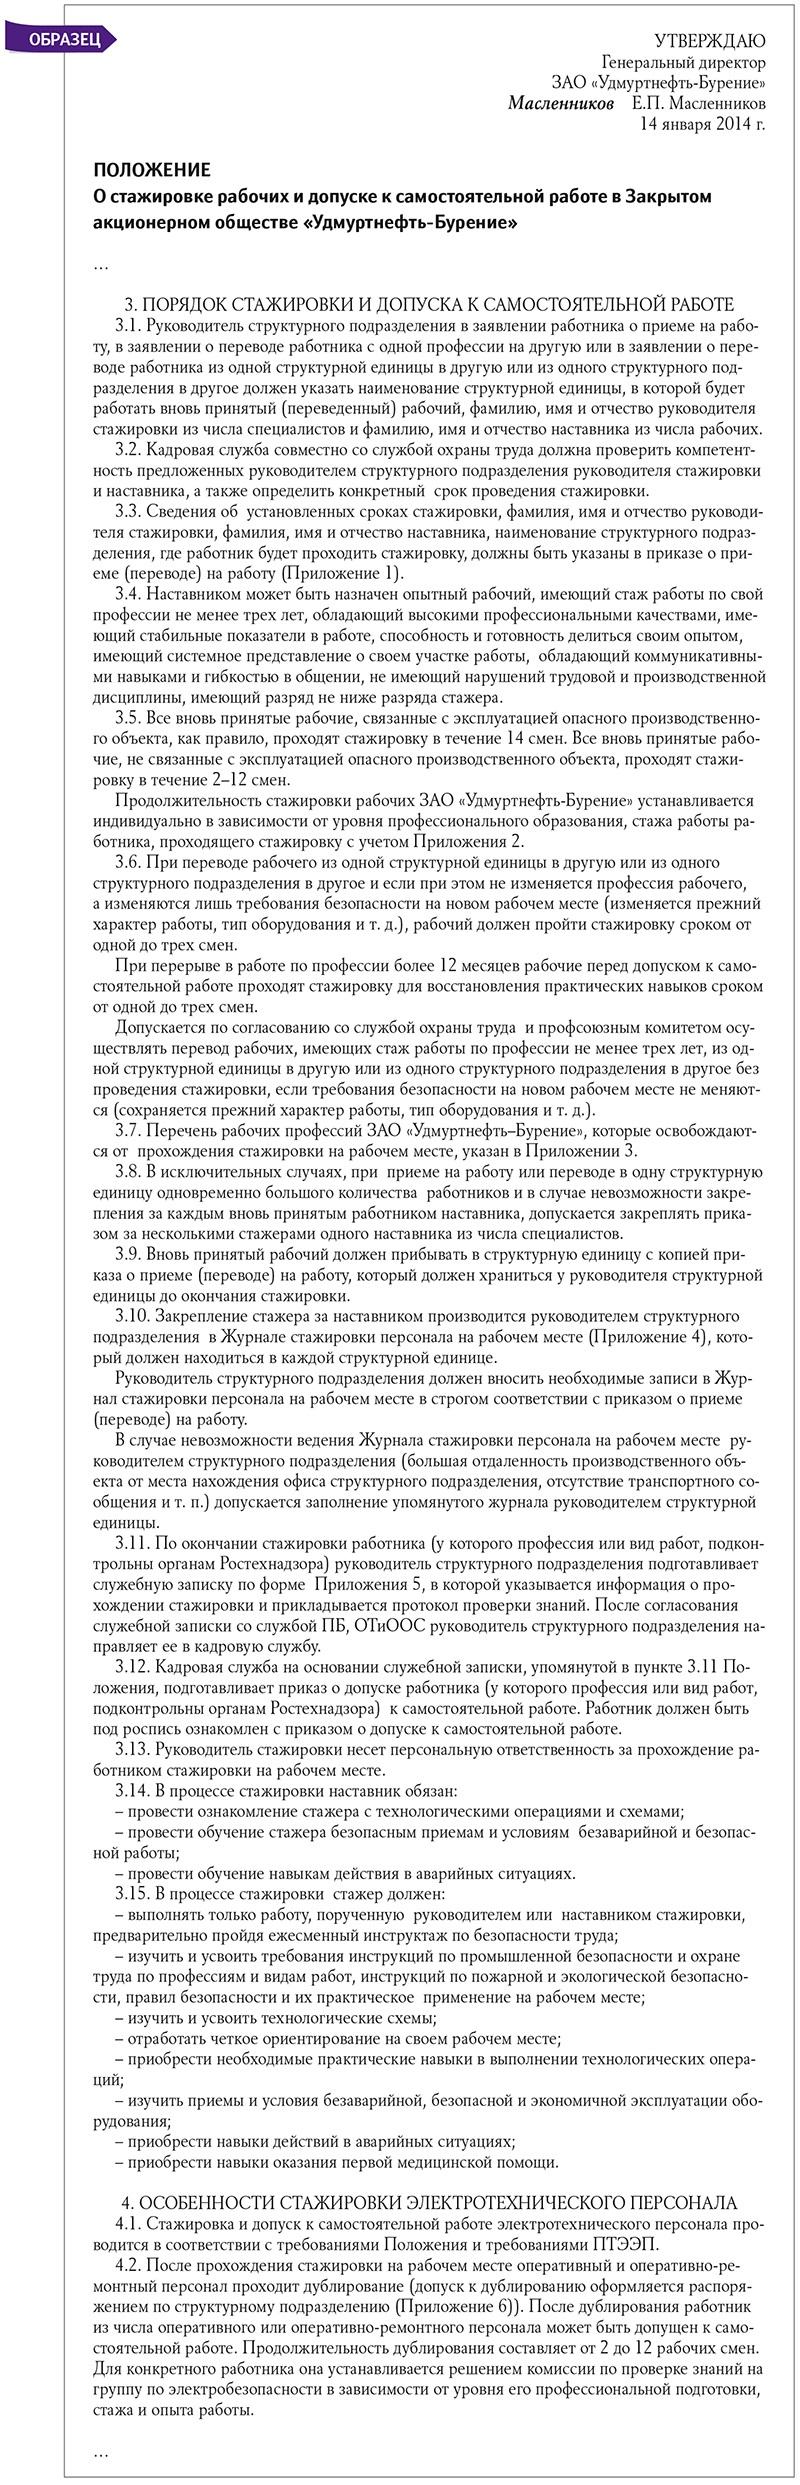 образец приказ о назначении бригадира